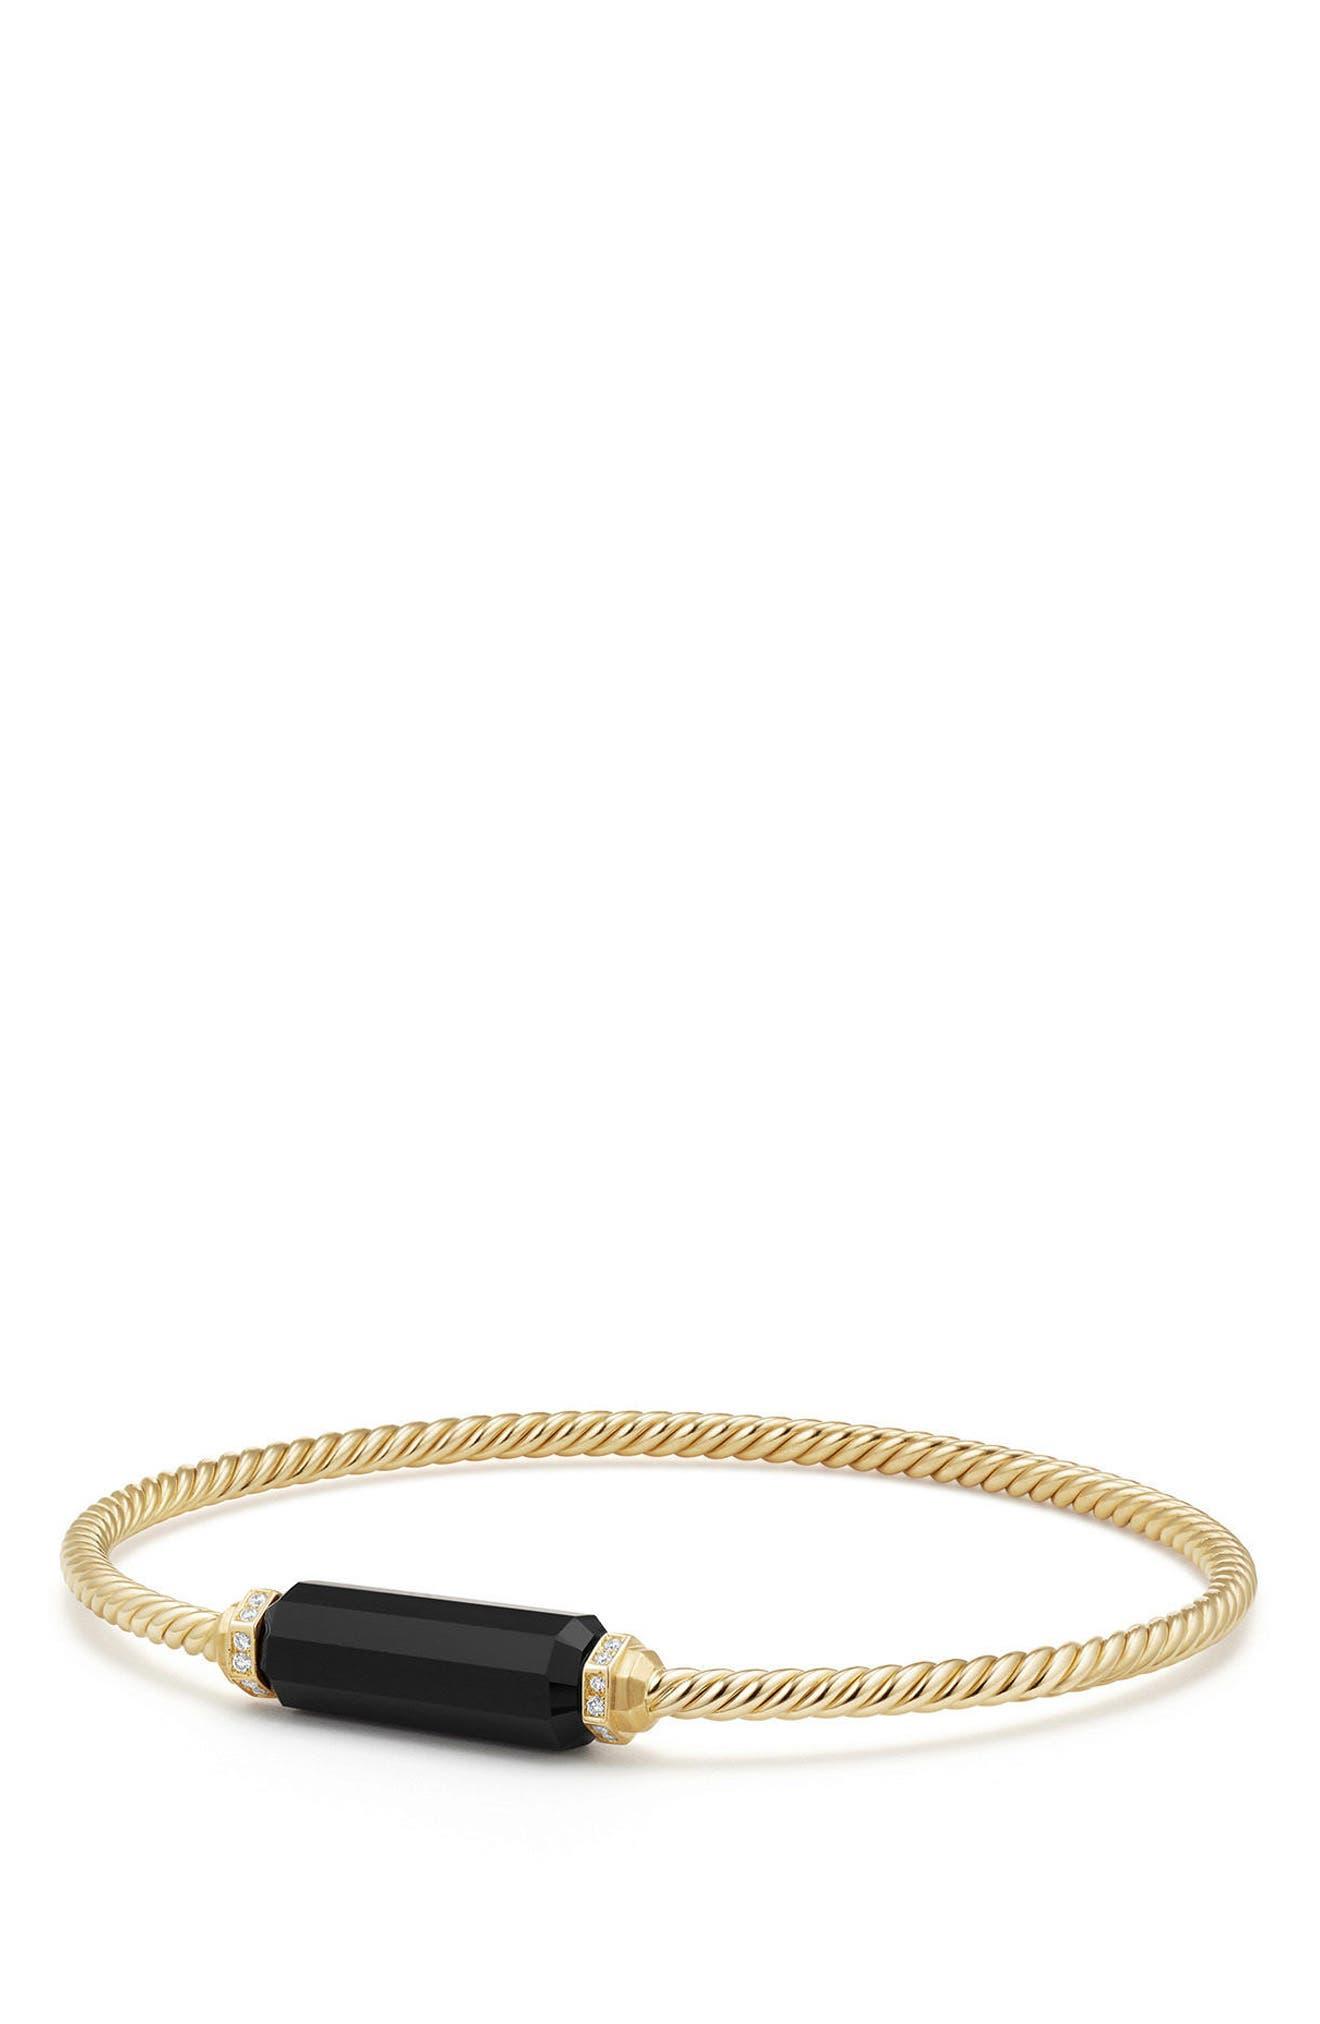 Barrels Bracelet with Diamonds in 18K Gold,                         Main,                         color, BLACK ONYX